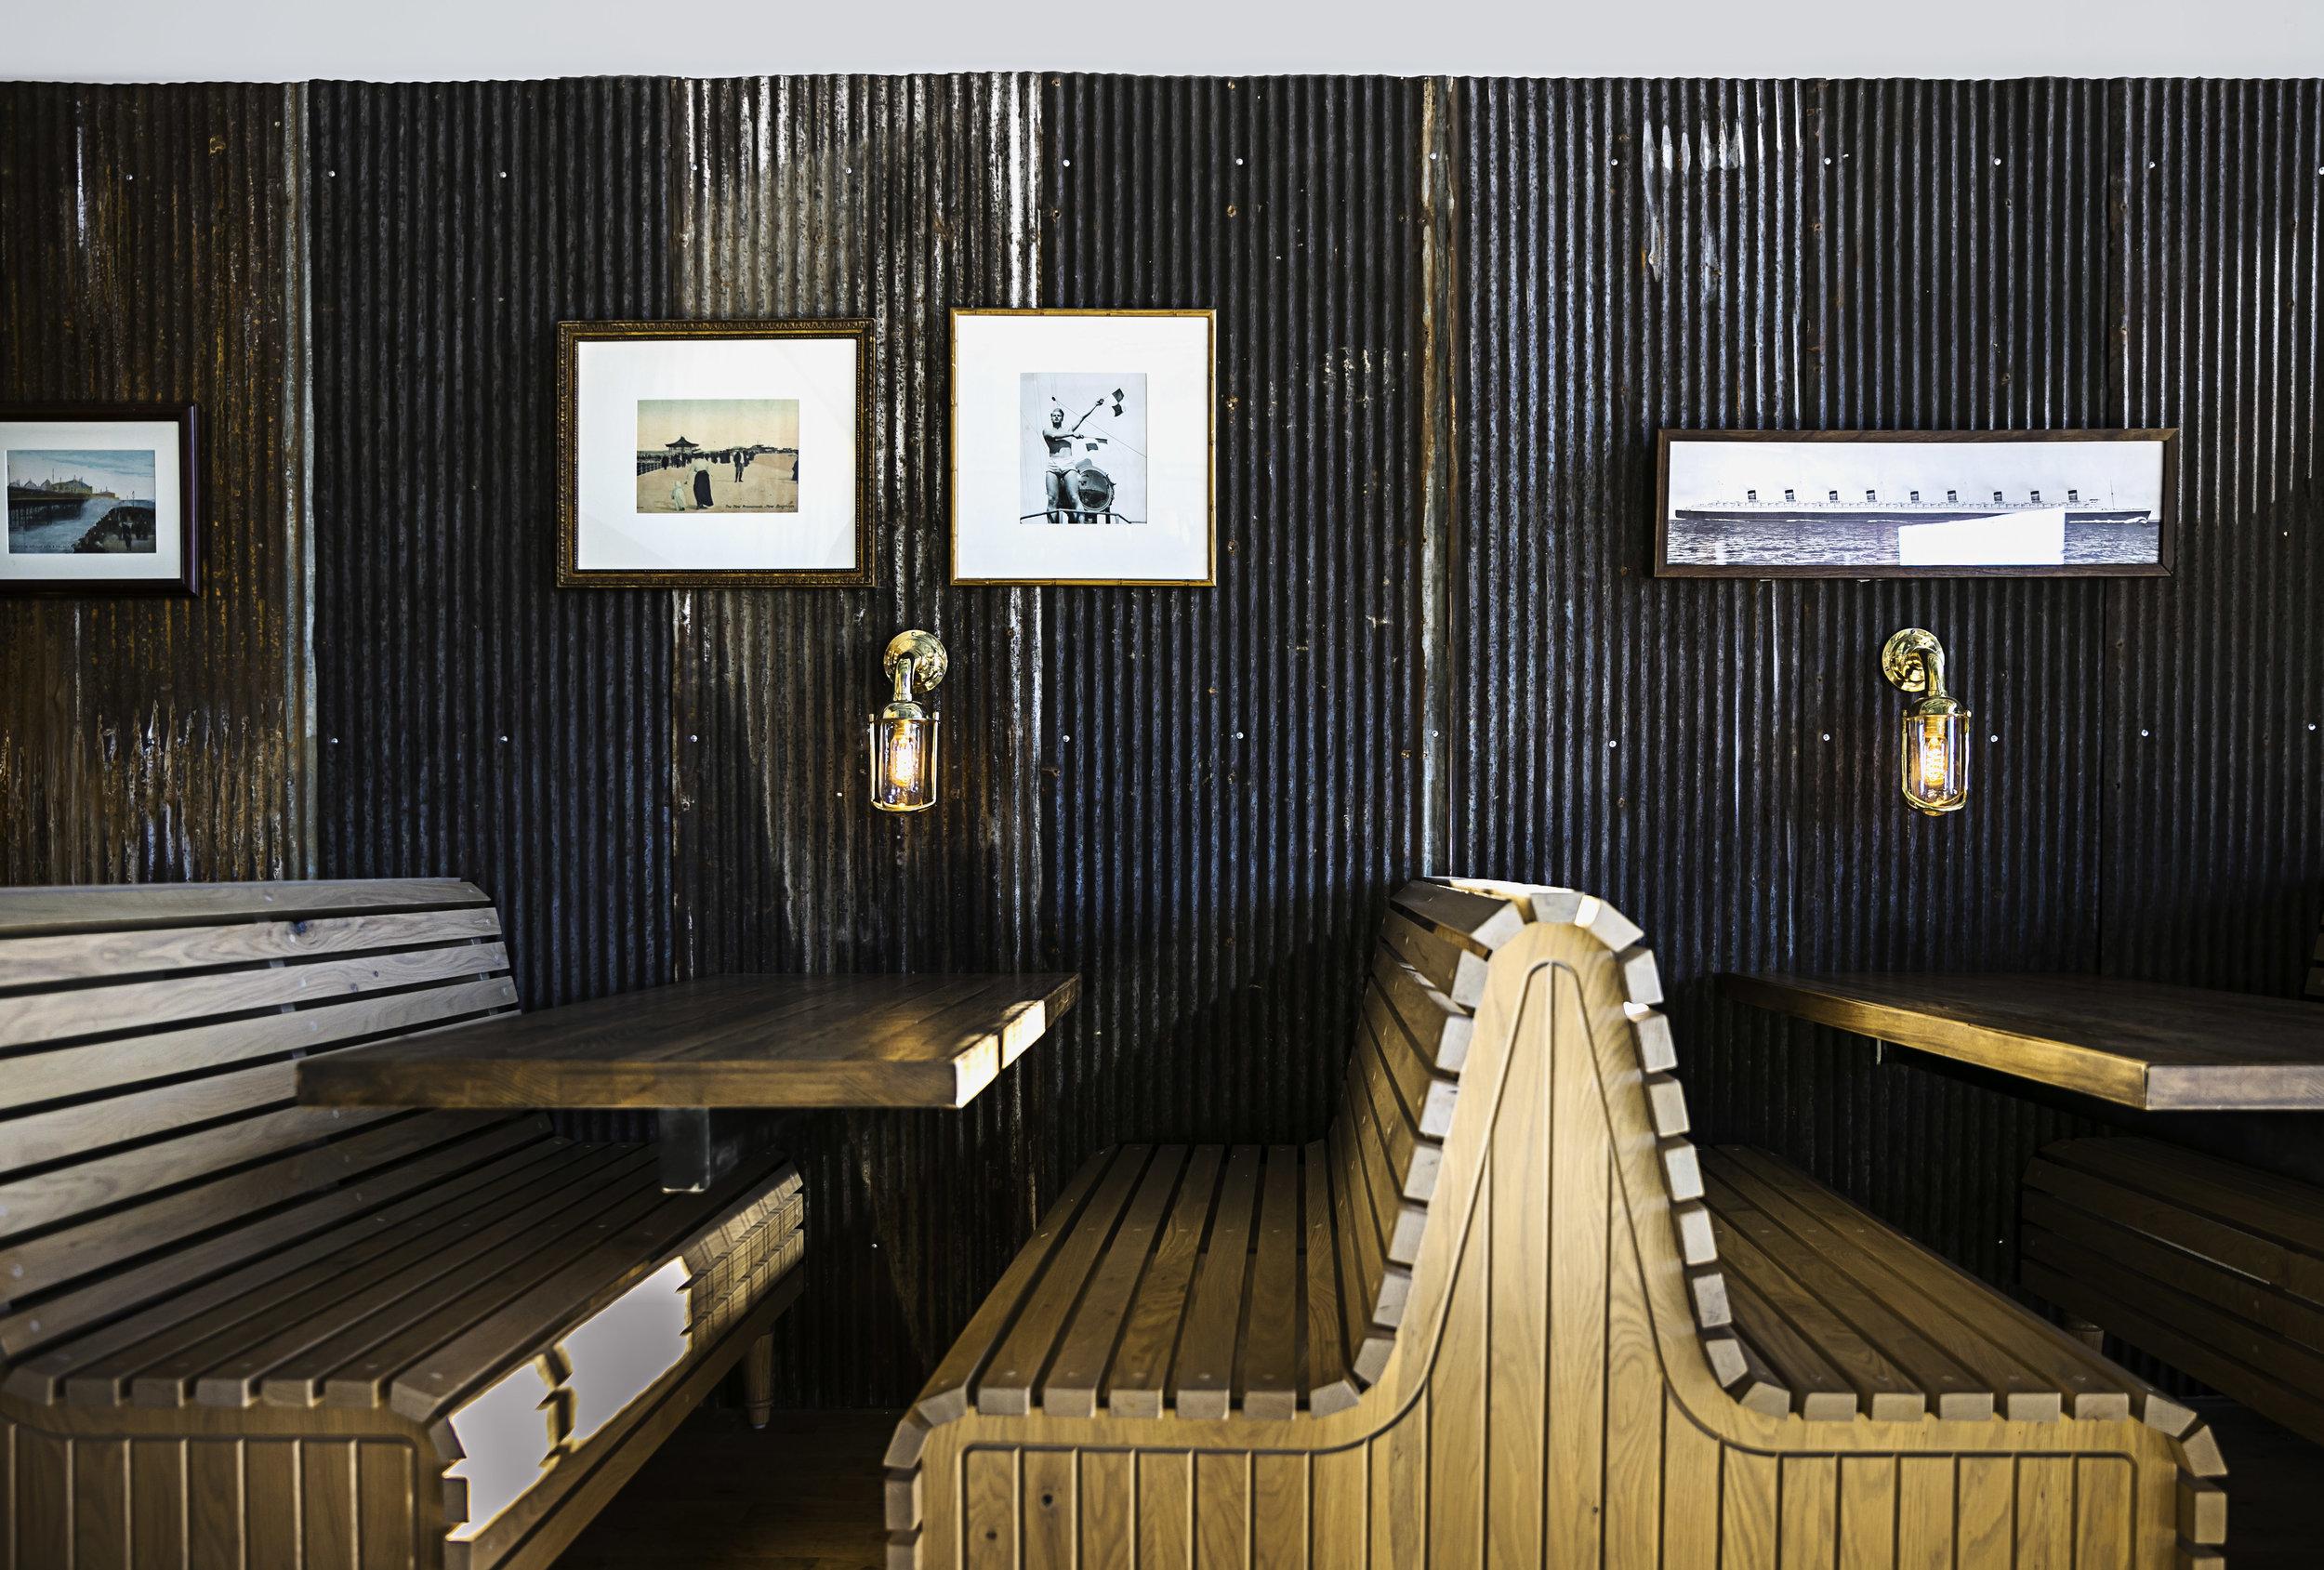 studio-saint-bars-and-restaurants-the-brighton-washington-dc-2